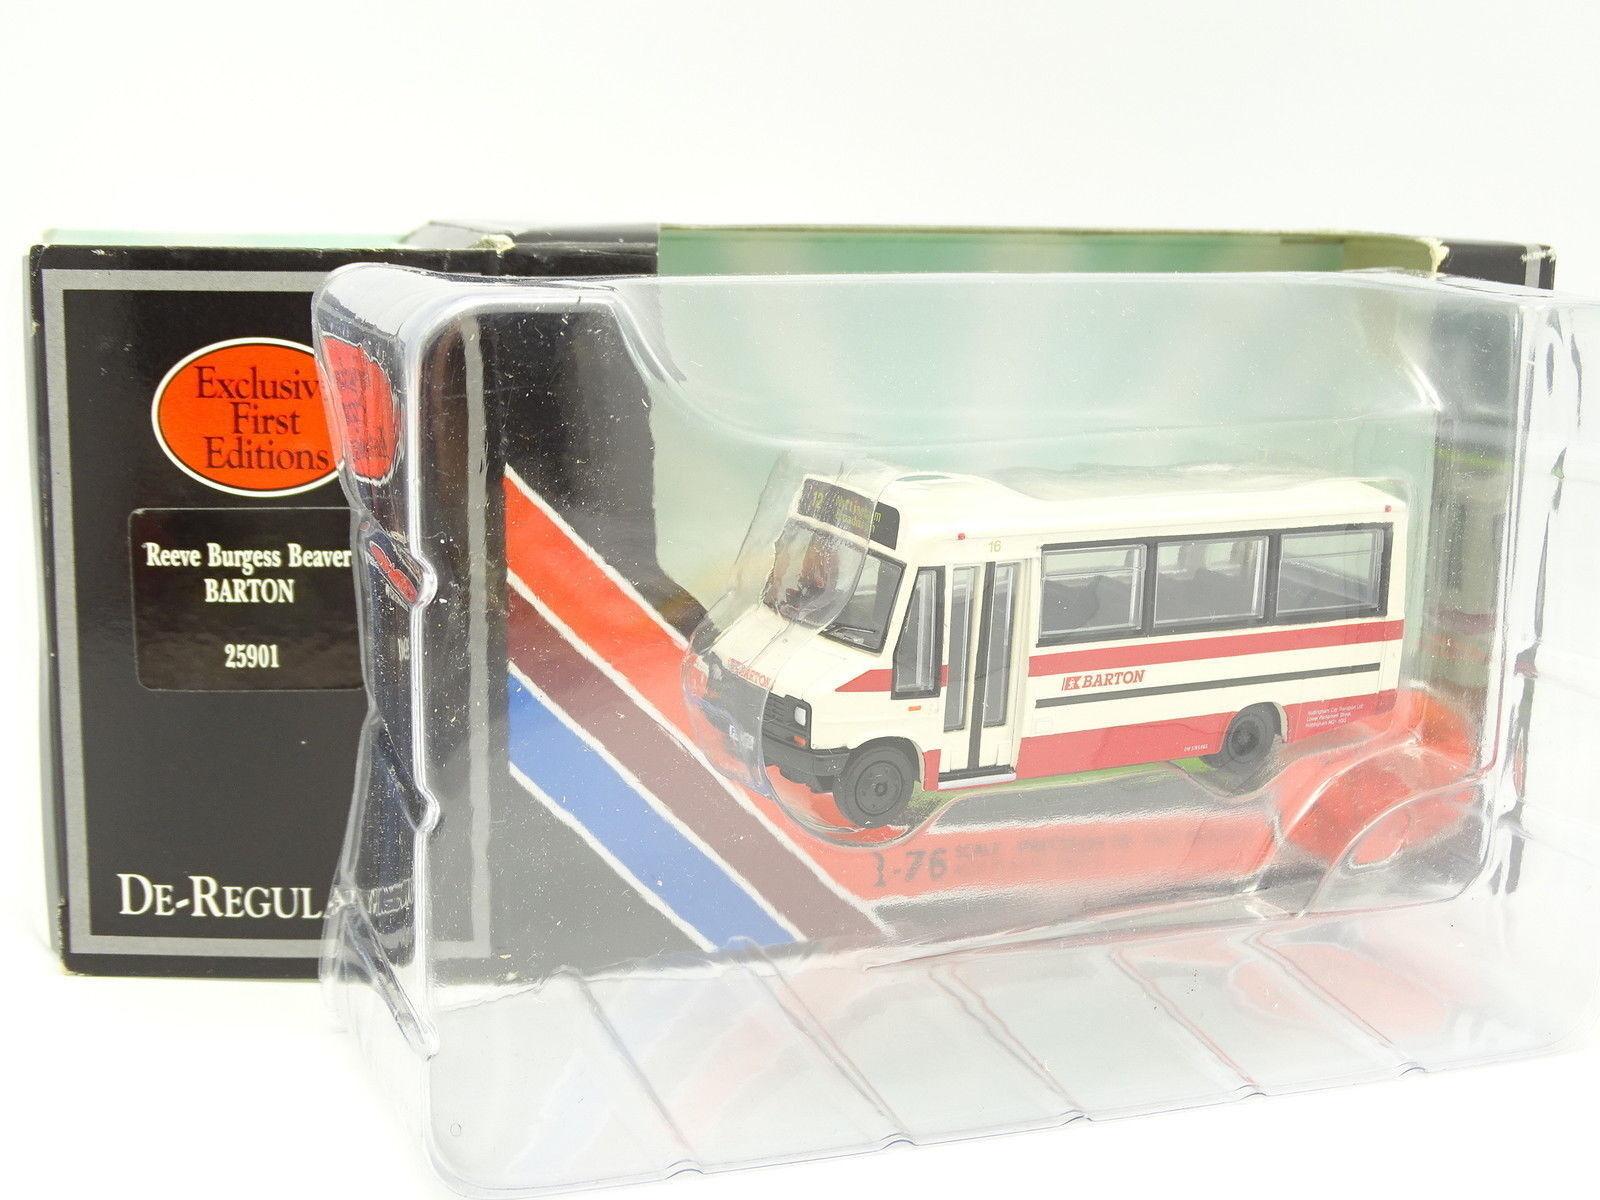 Gilbow 1 76 - Bus Bus Bus Bus Renault Thominette Reeve Burgess Biber - Barton 0952e9